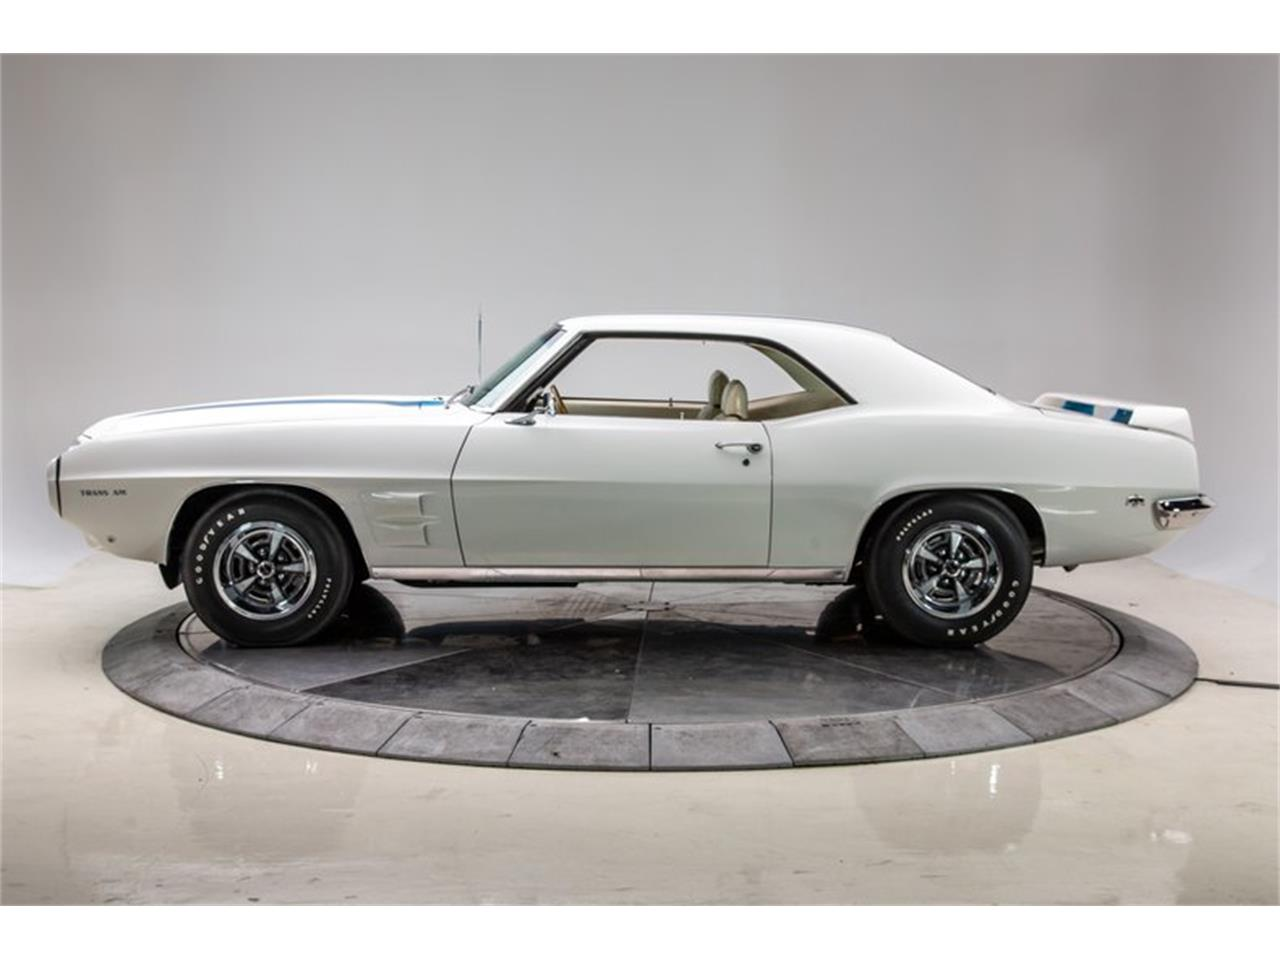 Large Picture of Classic '69 Pontiac Firebird Trans Am - $99,950.00 - QZ74